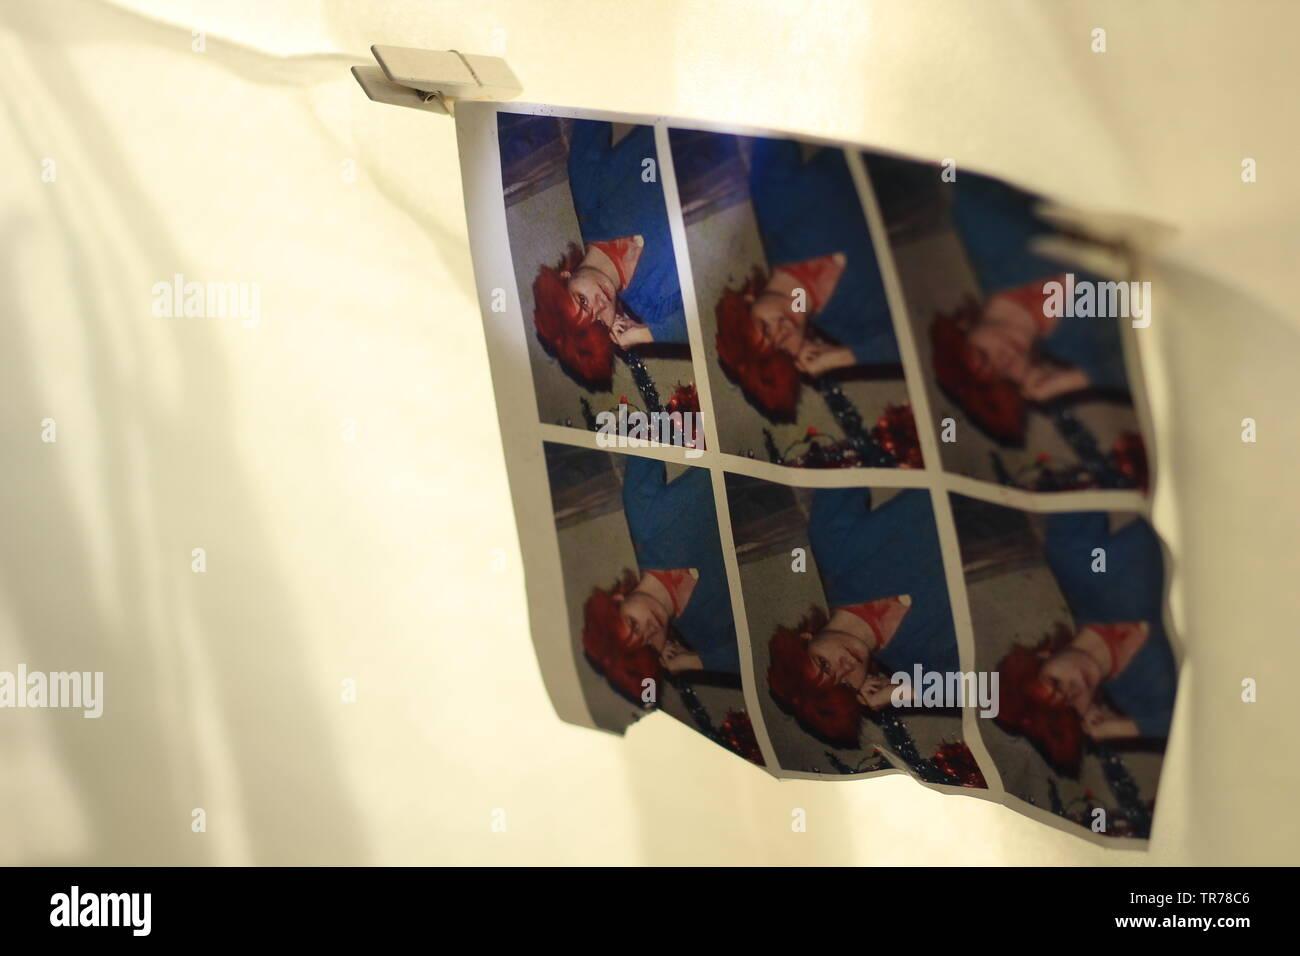 Downloading Human - An Abstract Series ' Digitally Edited Humans' - Stock Image